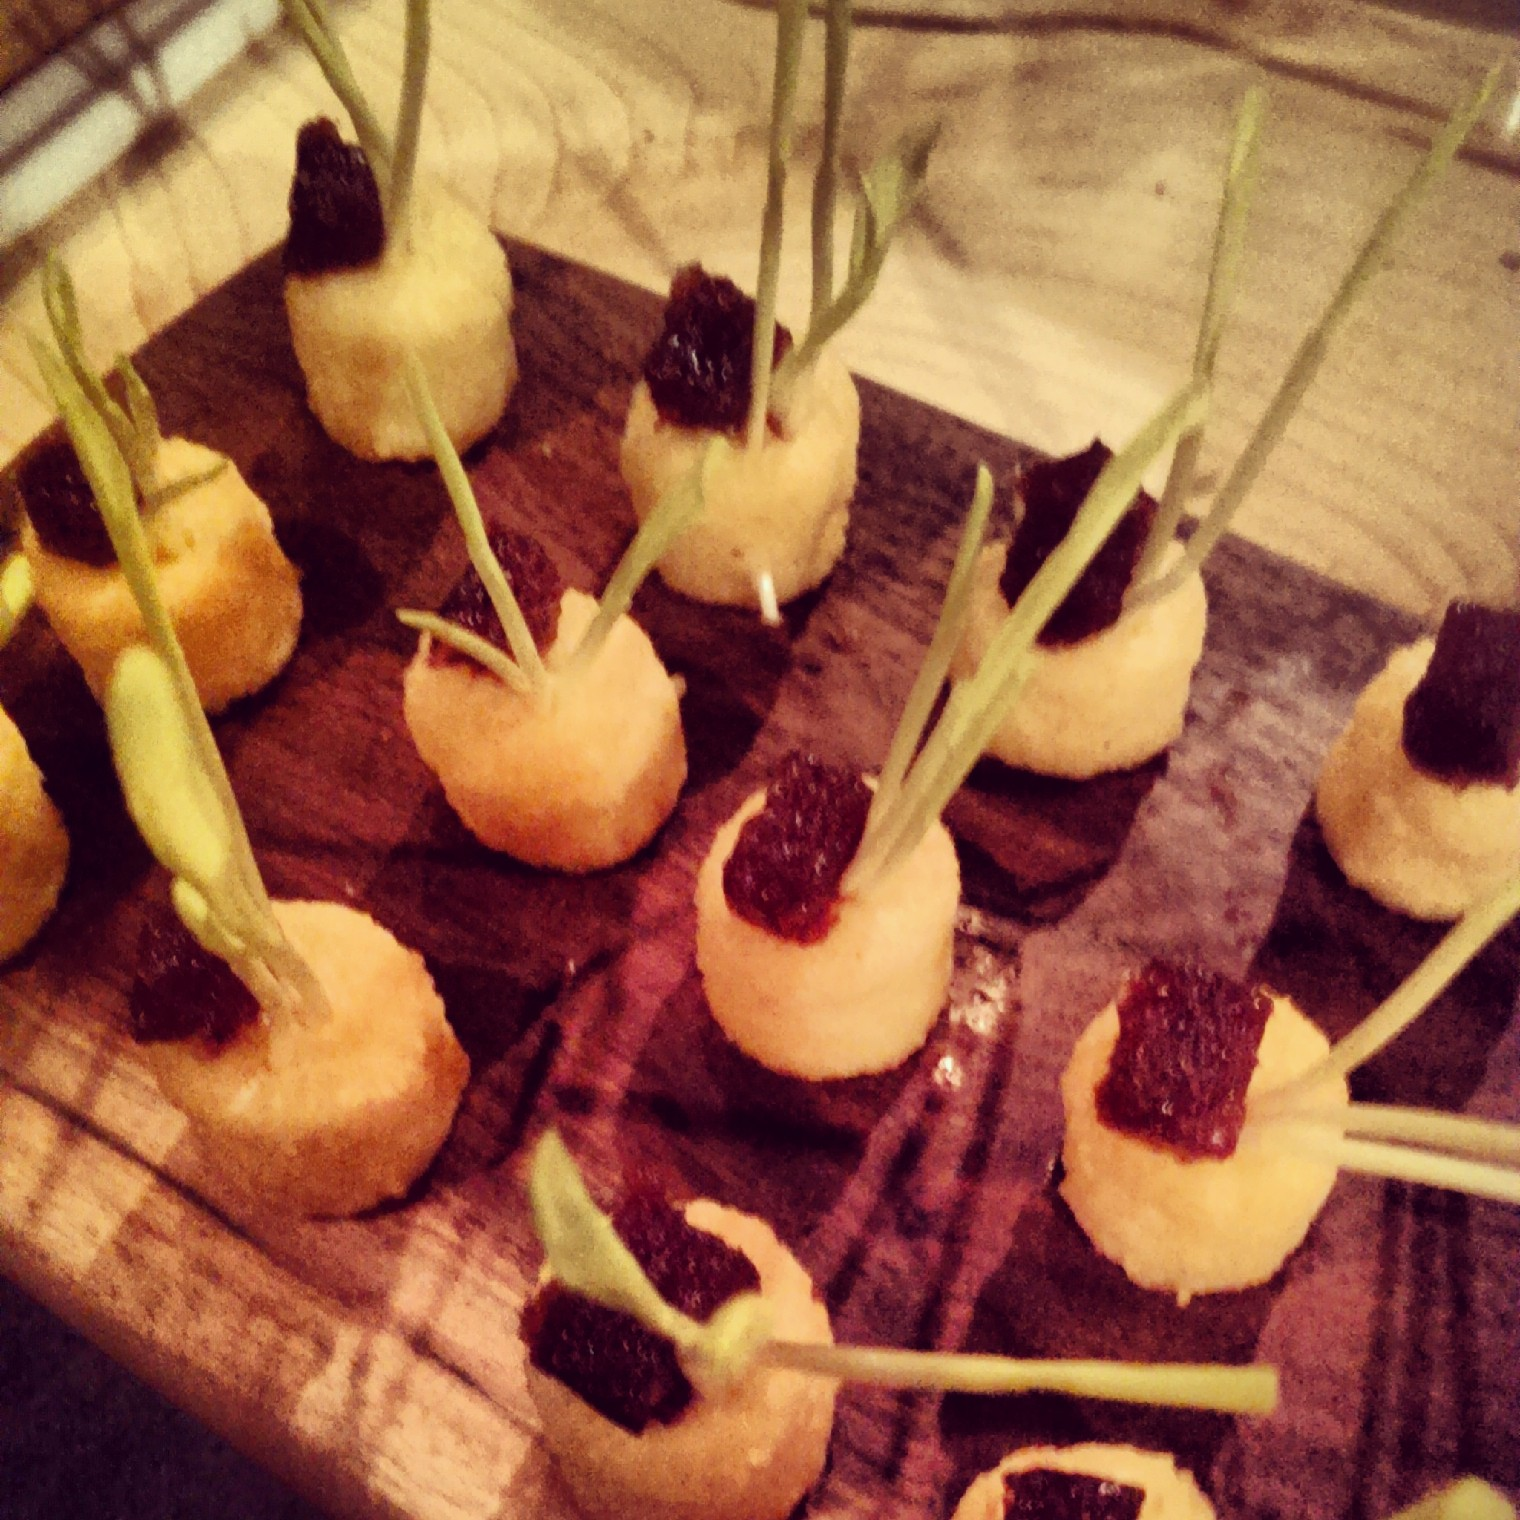 Polenta / Cornshoot / Smoked Onion Gel